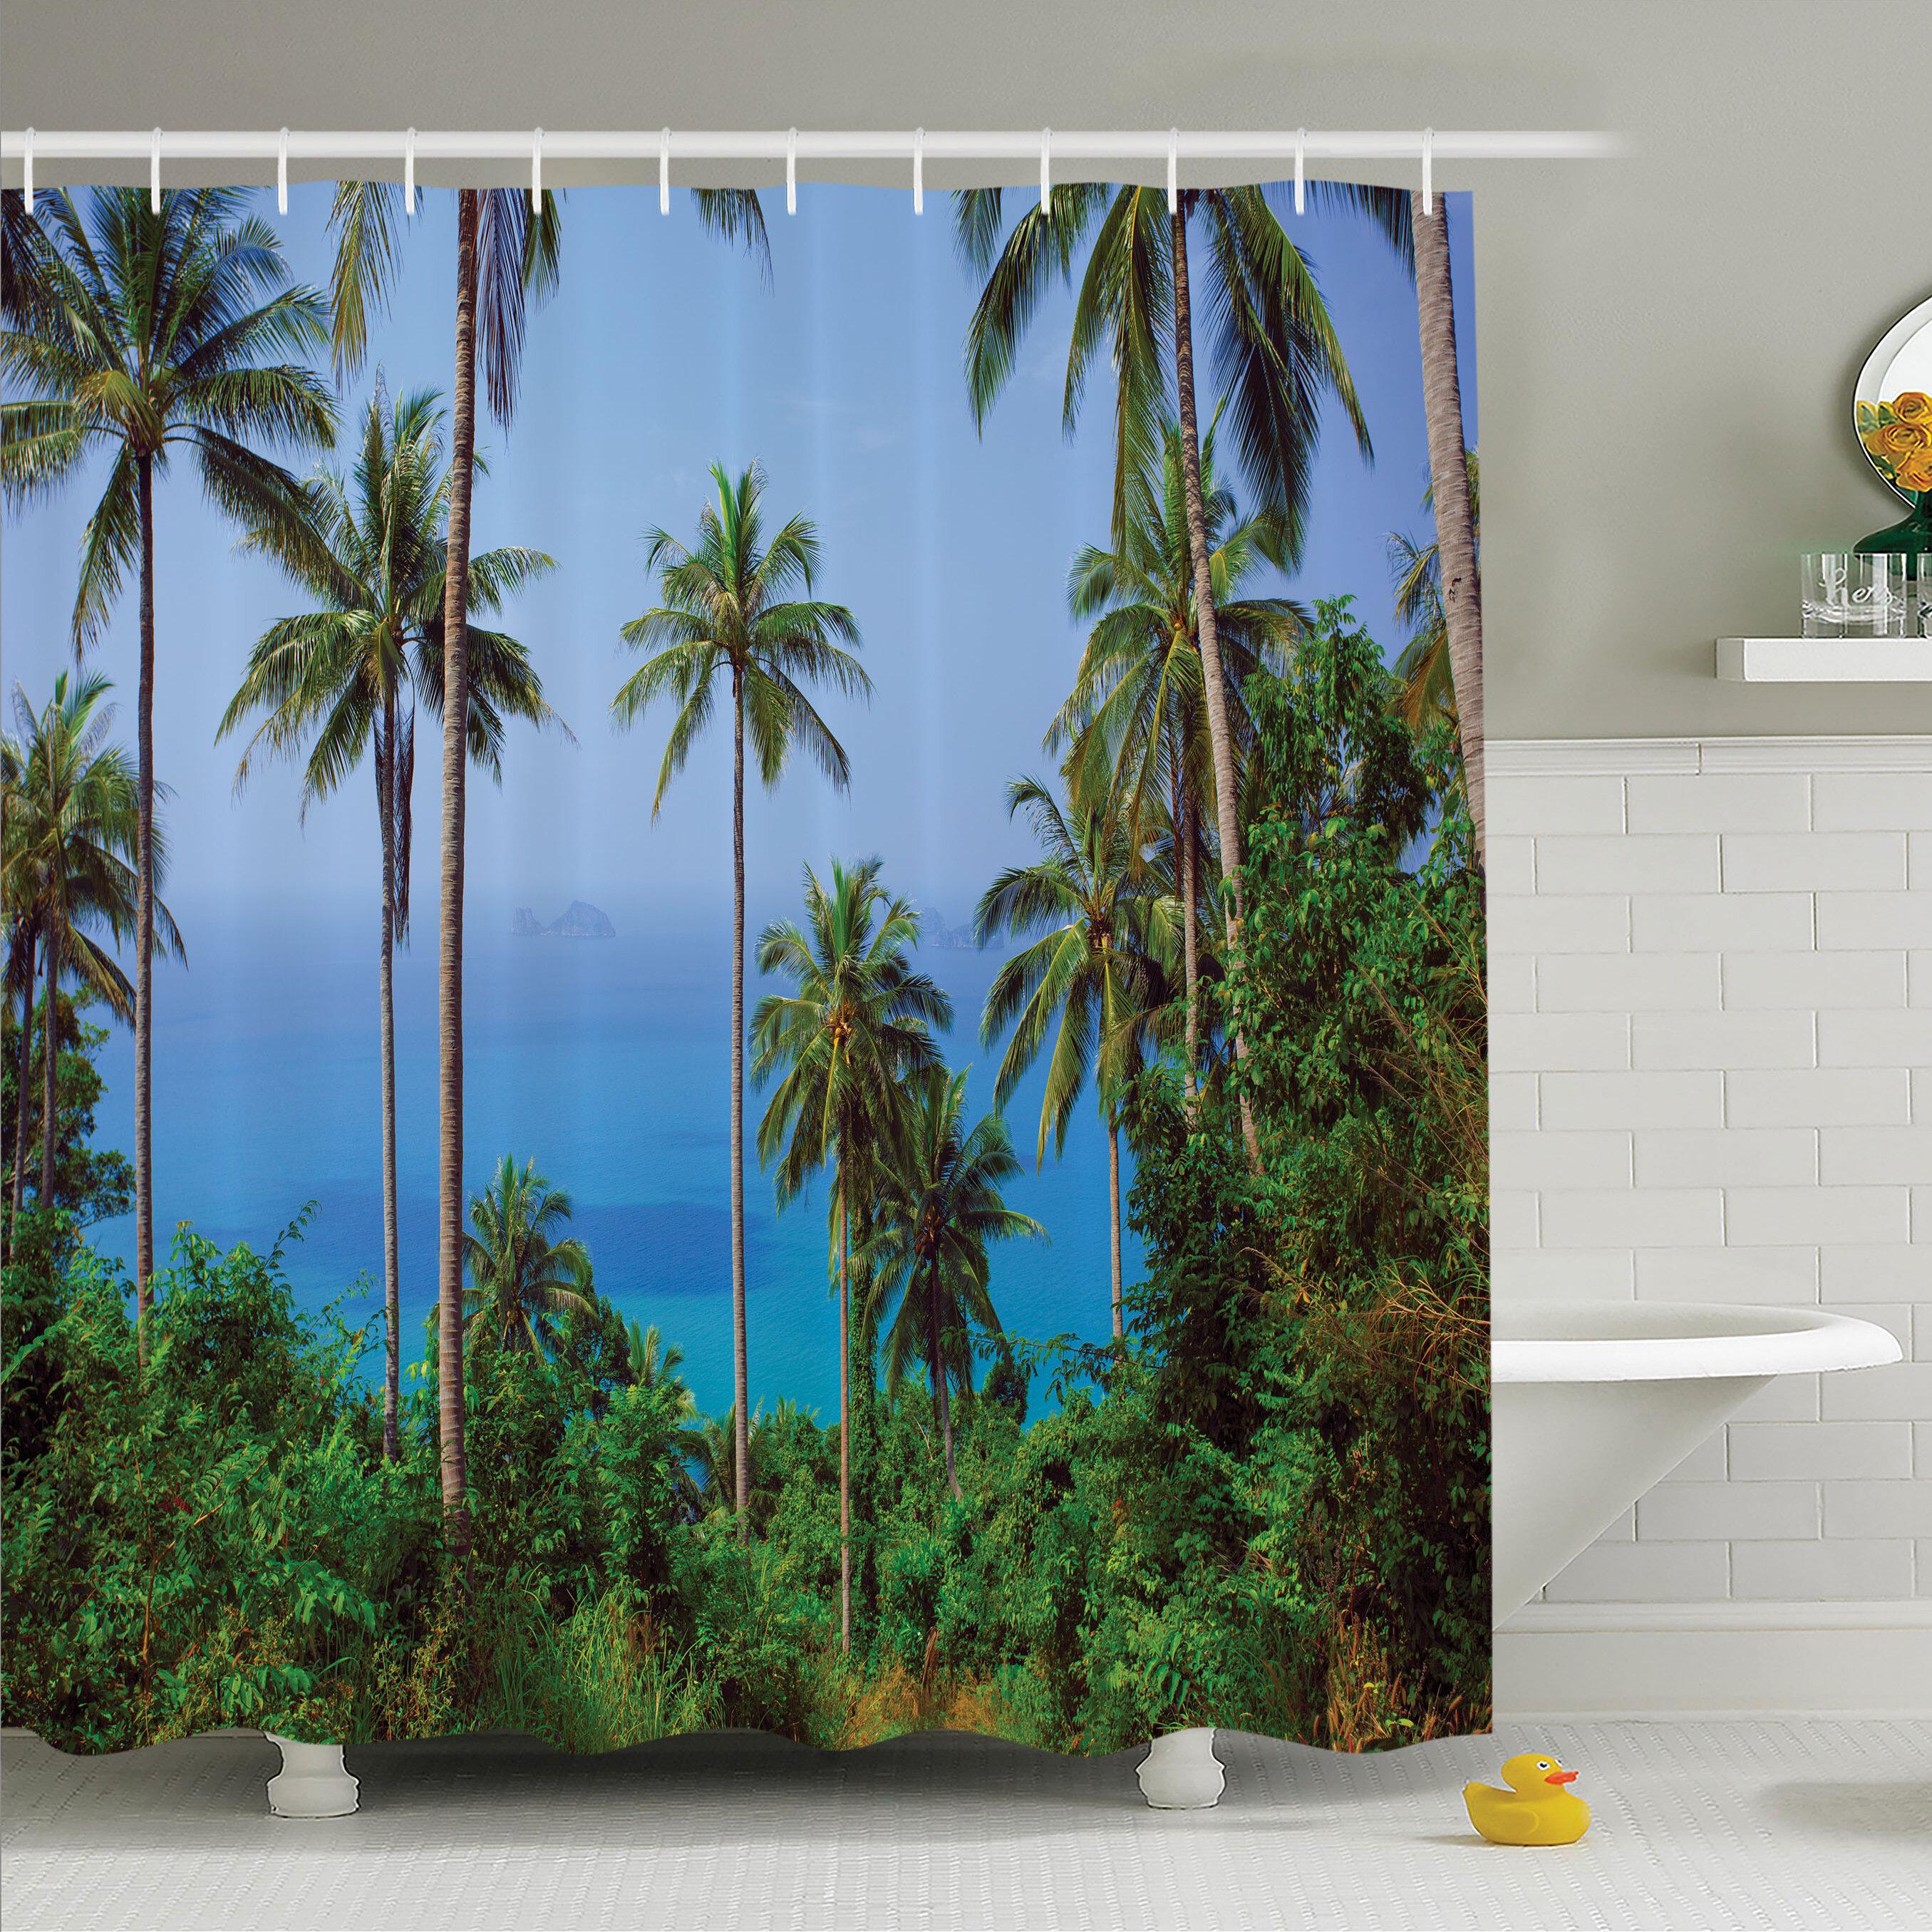 Palm Tree Tropical Waters Green Leaf Beach Shower Curtain Set Bathroom Decor Shower Bathtub Accessories Bath